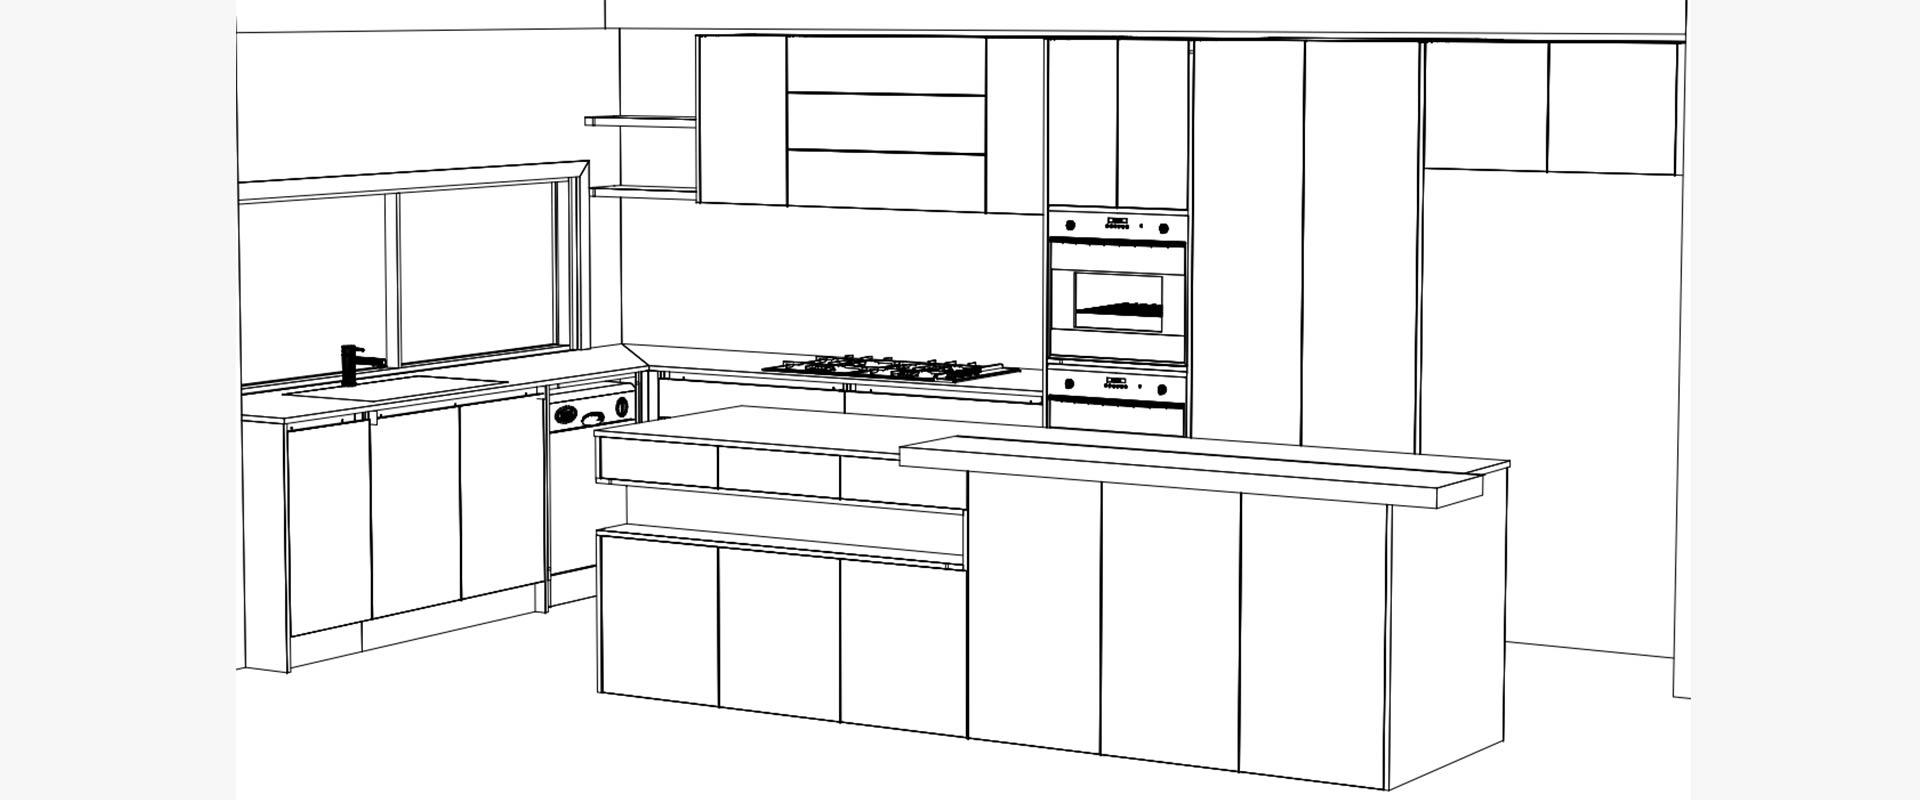 Smythes Creek Kitchen Renovation 4 3D Render